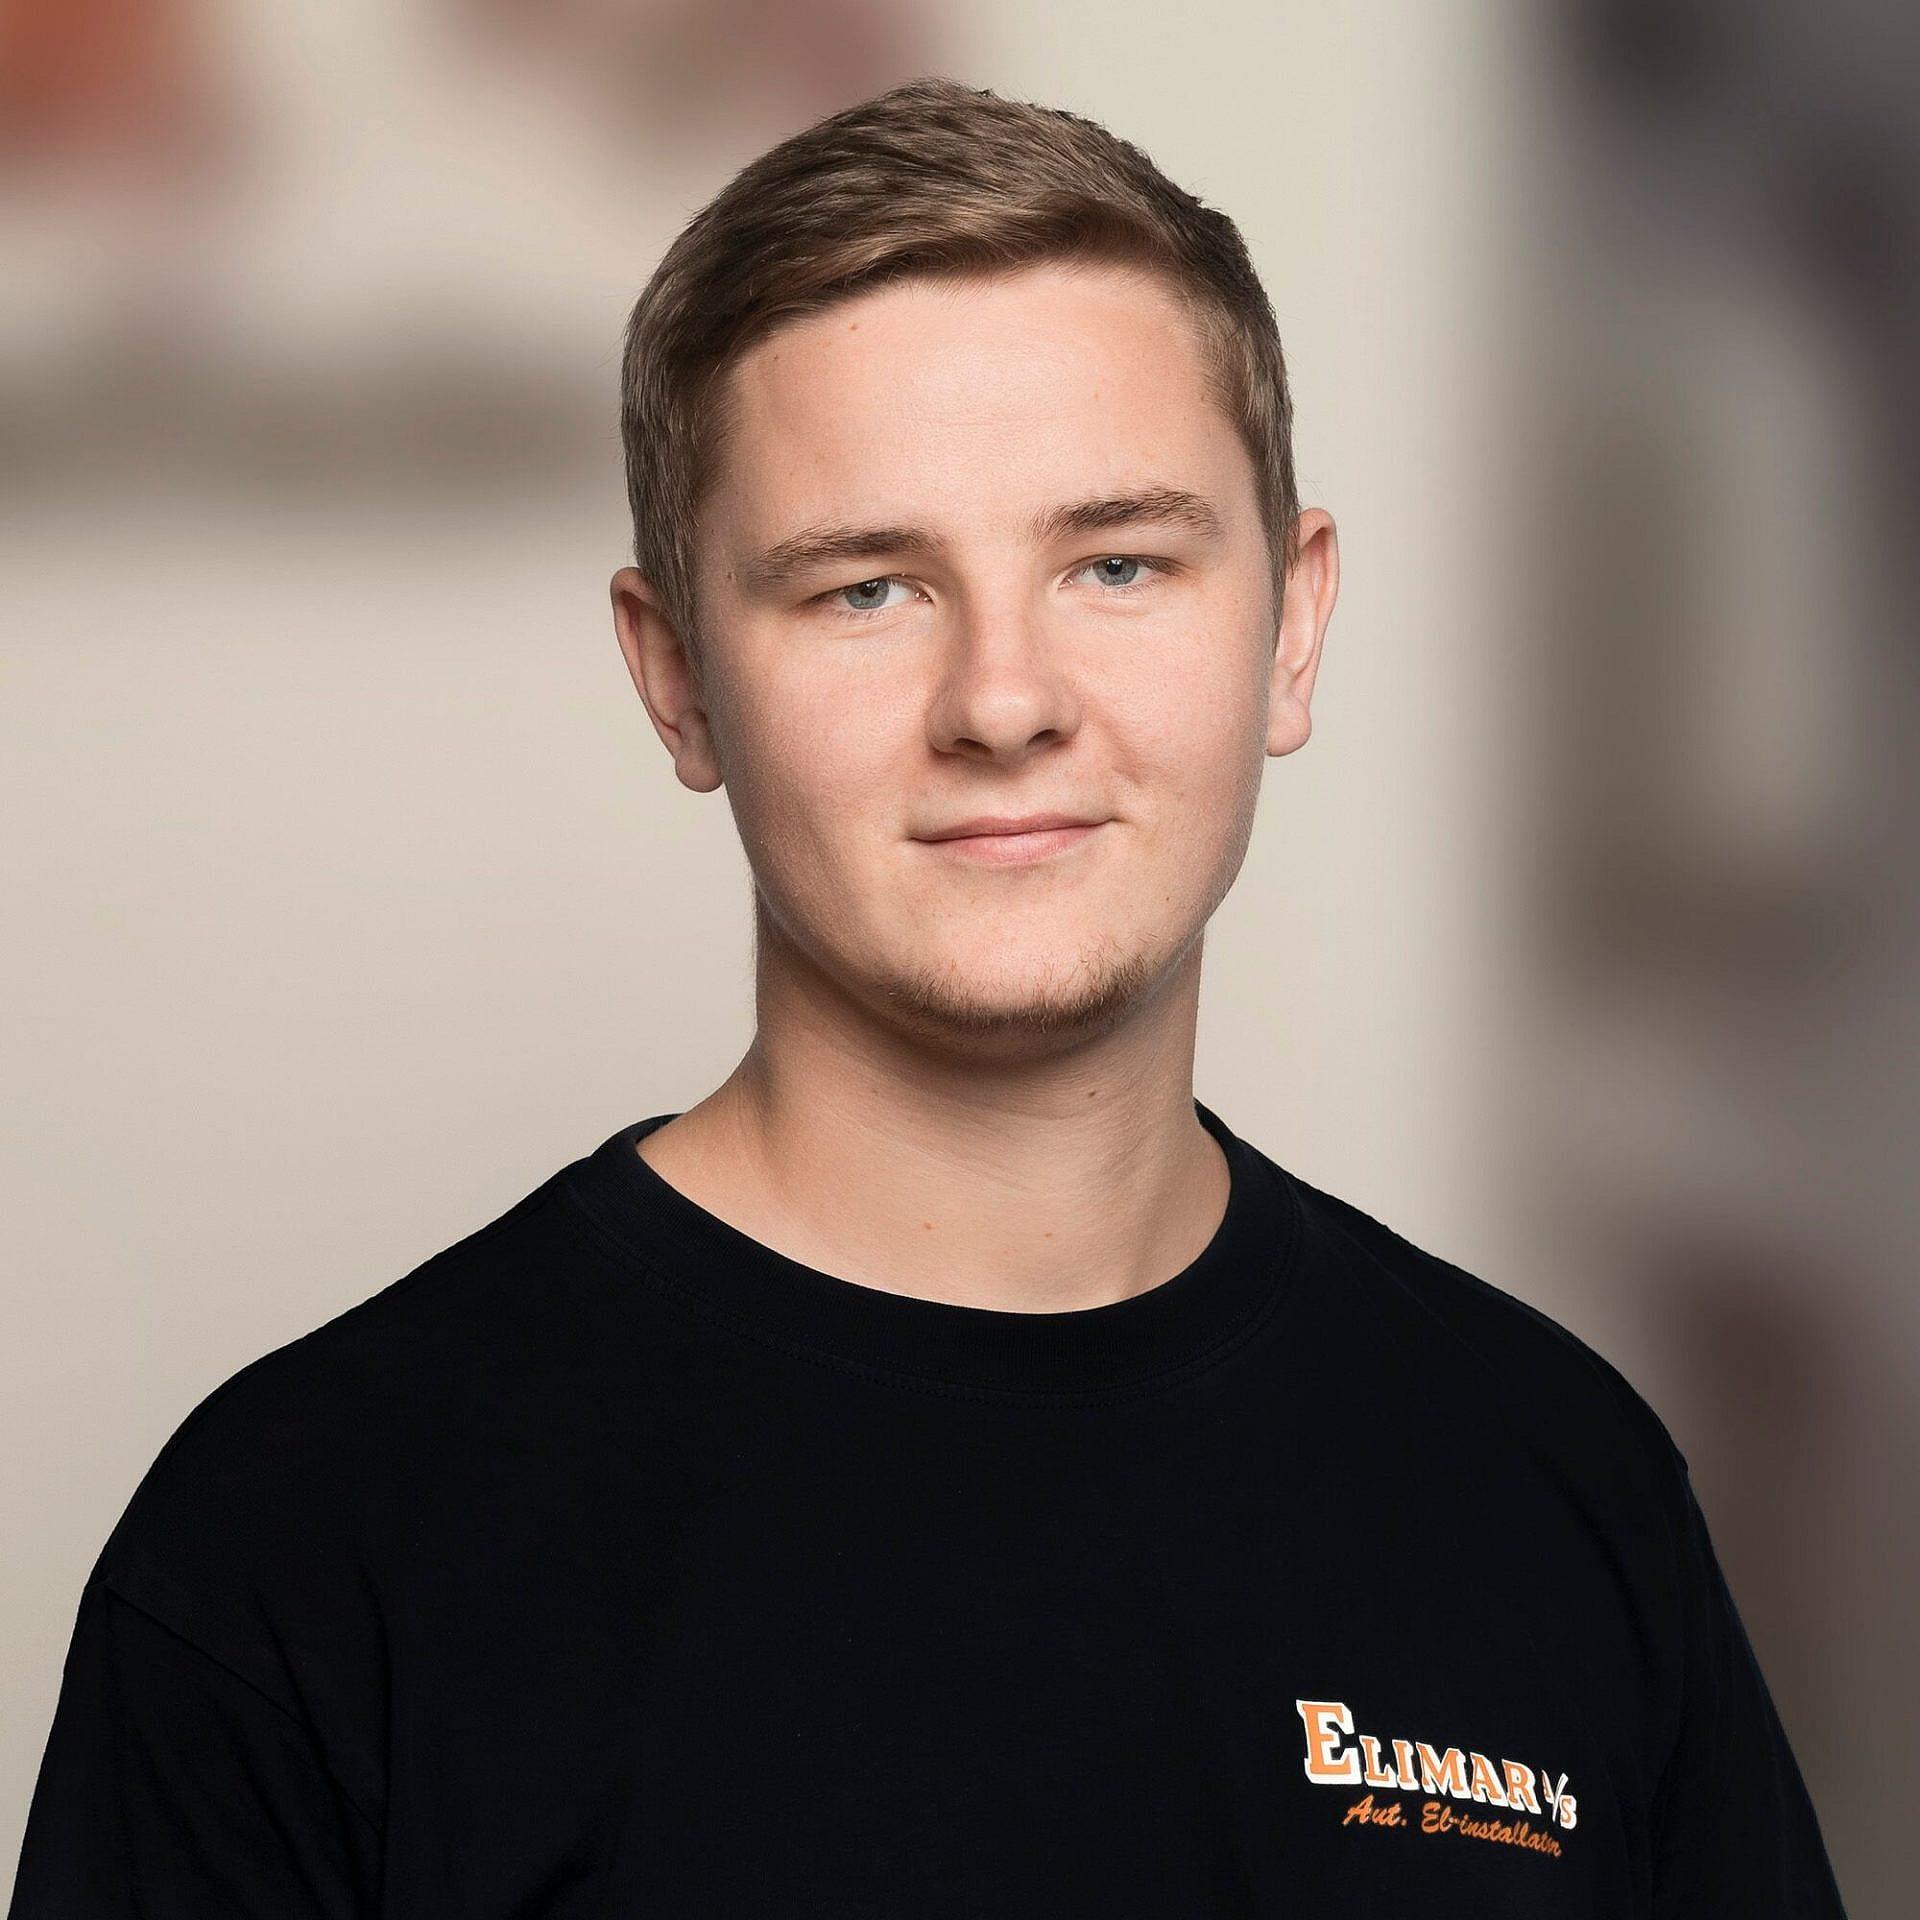 Magnus Erlangsen